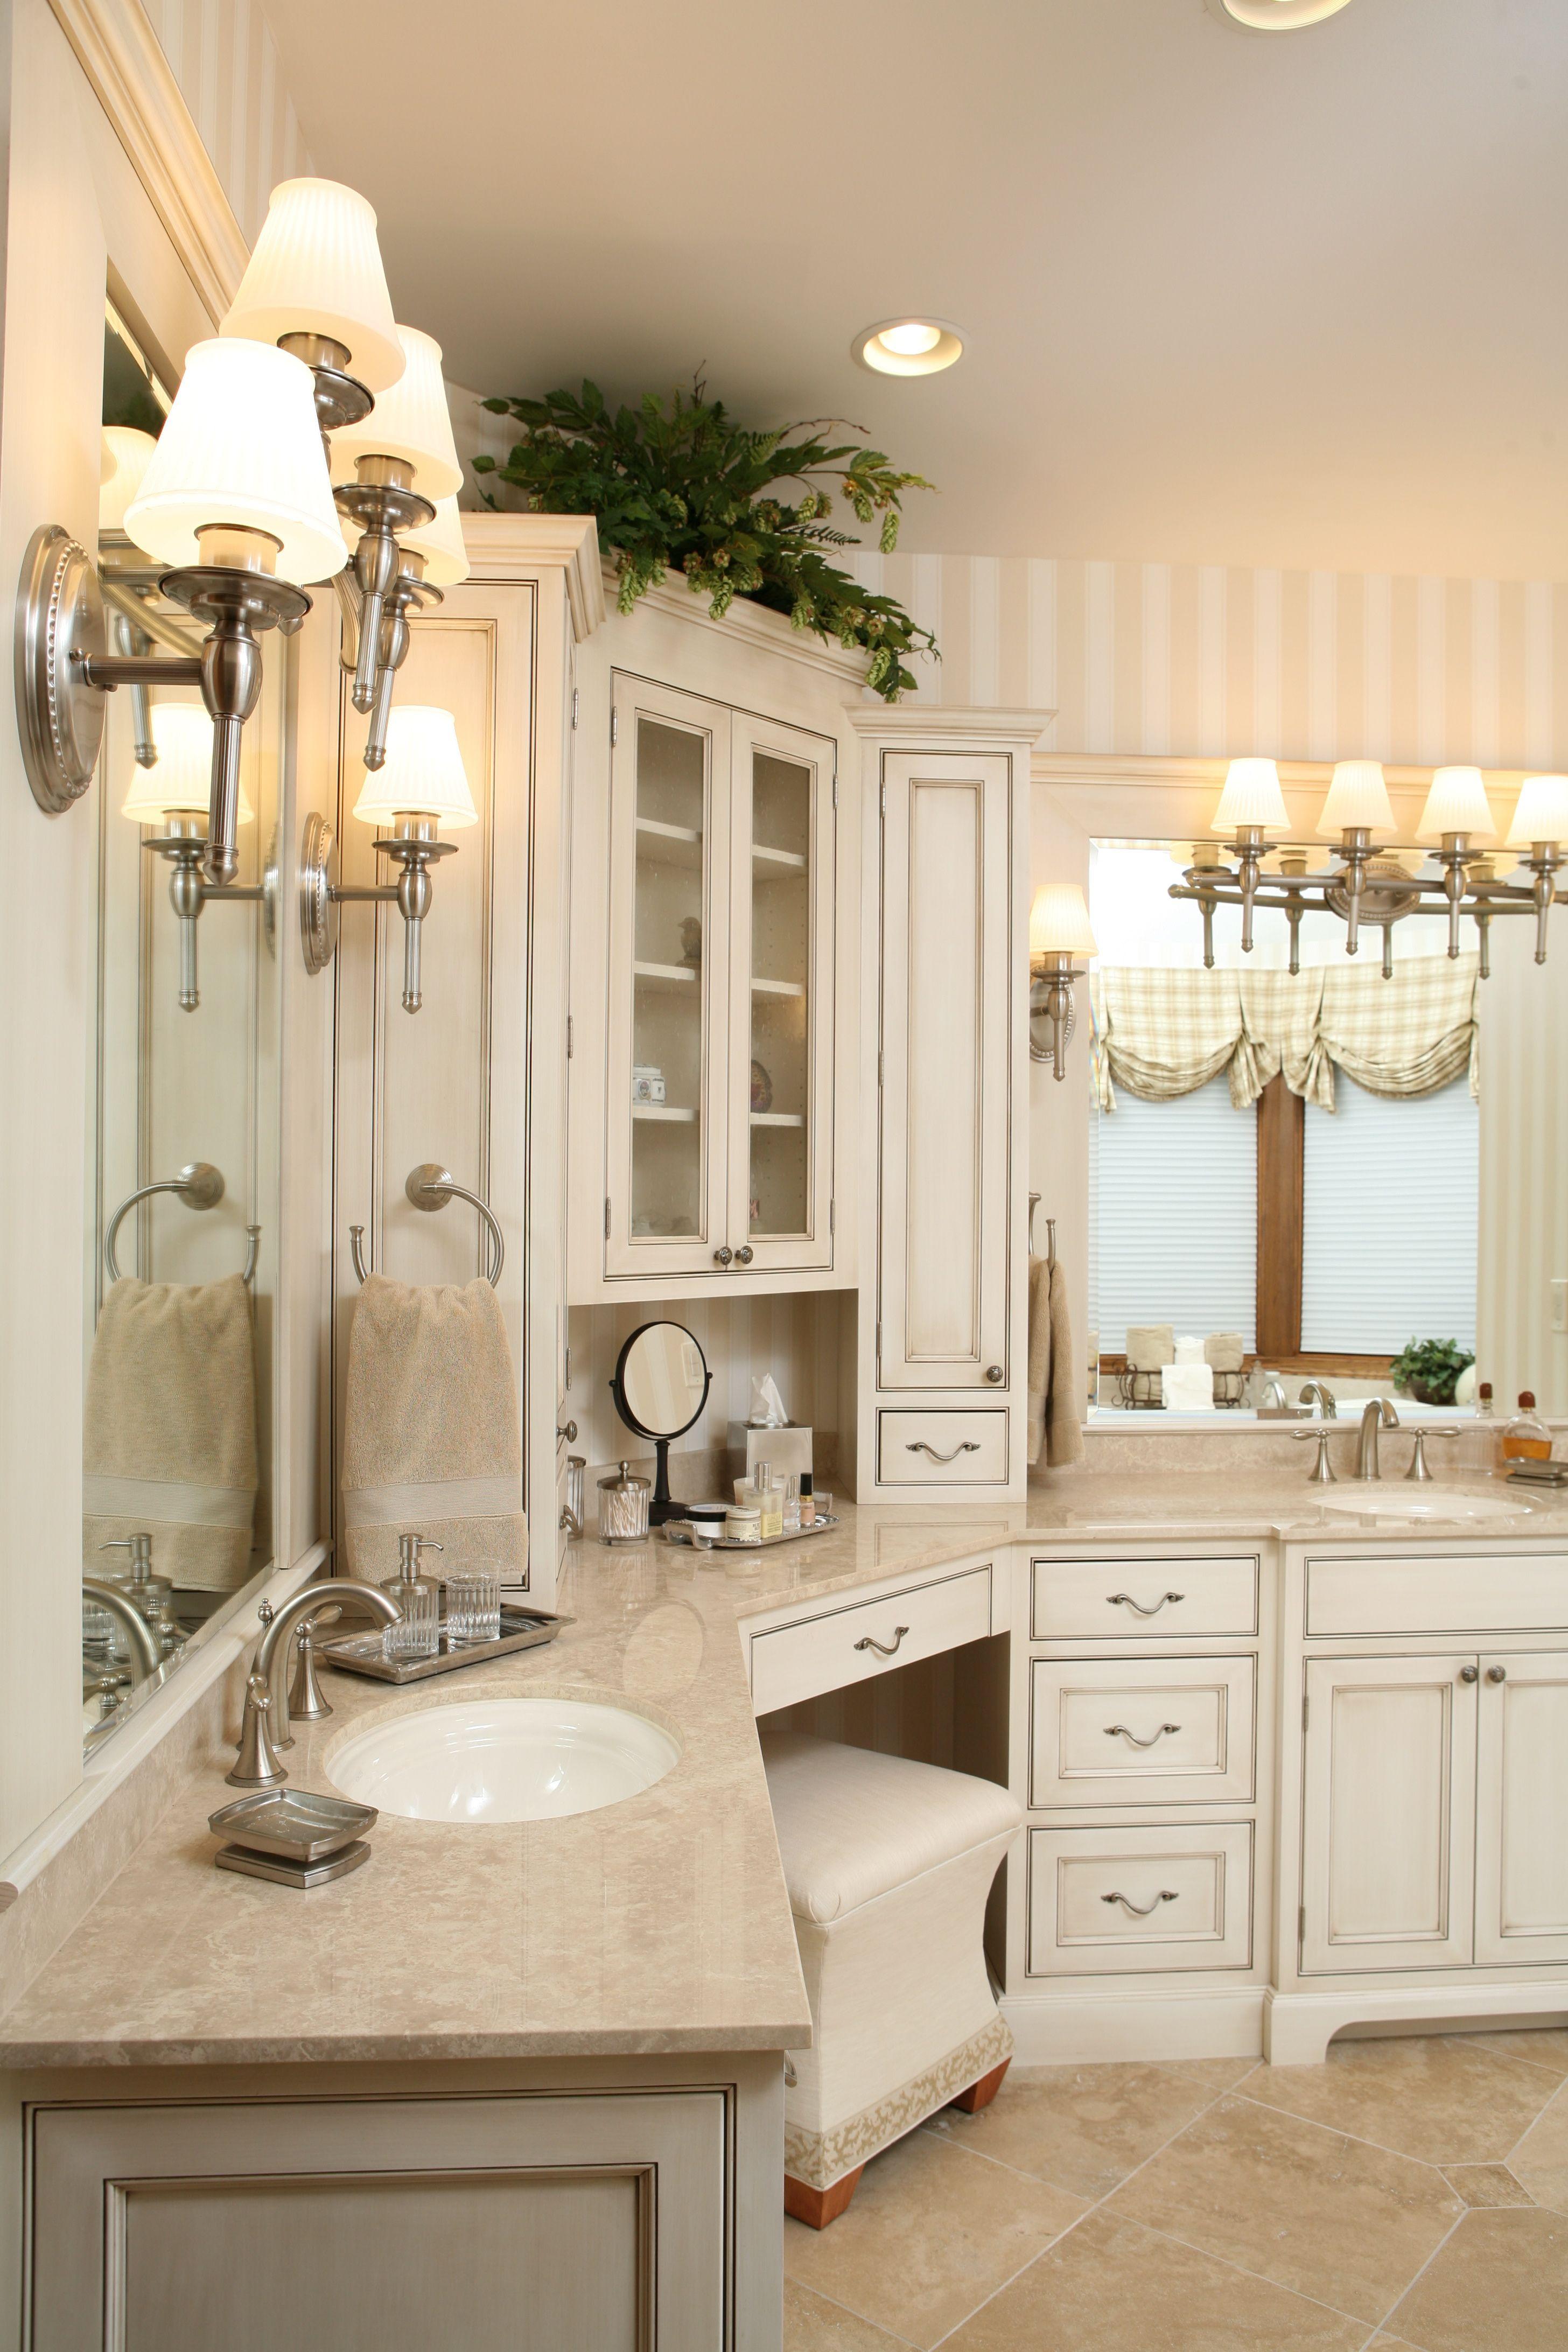 Sweet Peas Design Master Bathroom Corner Bathroom Vanity Master Bathroom Design Traditional Bathroom